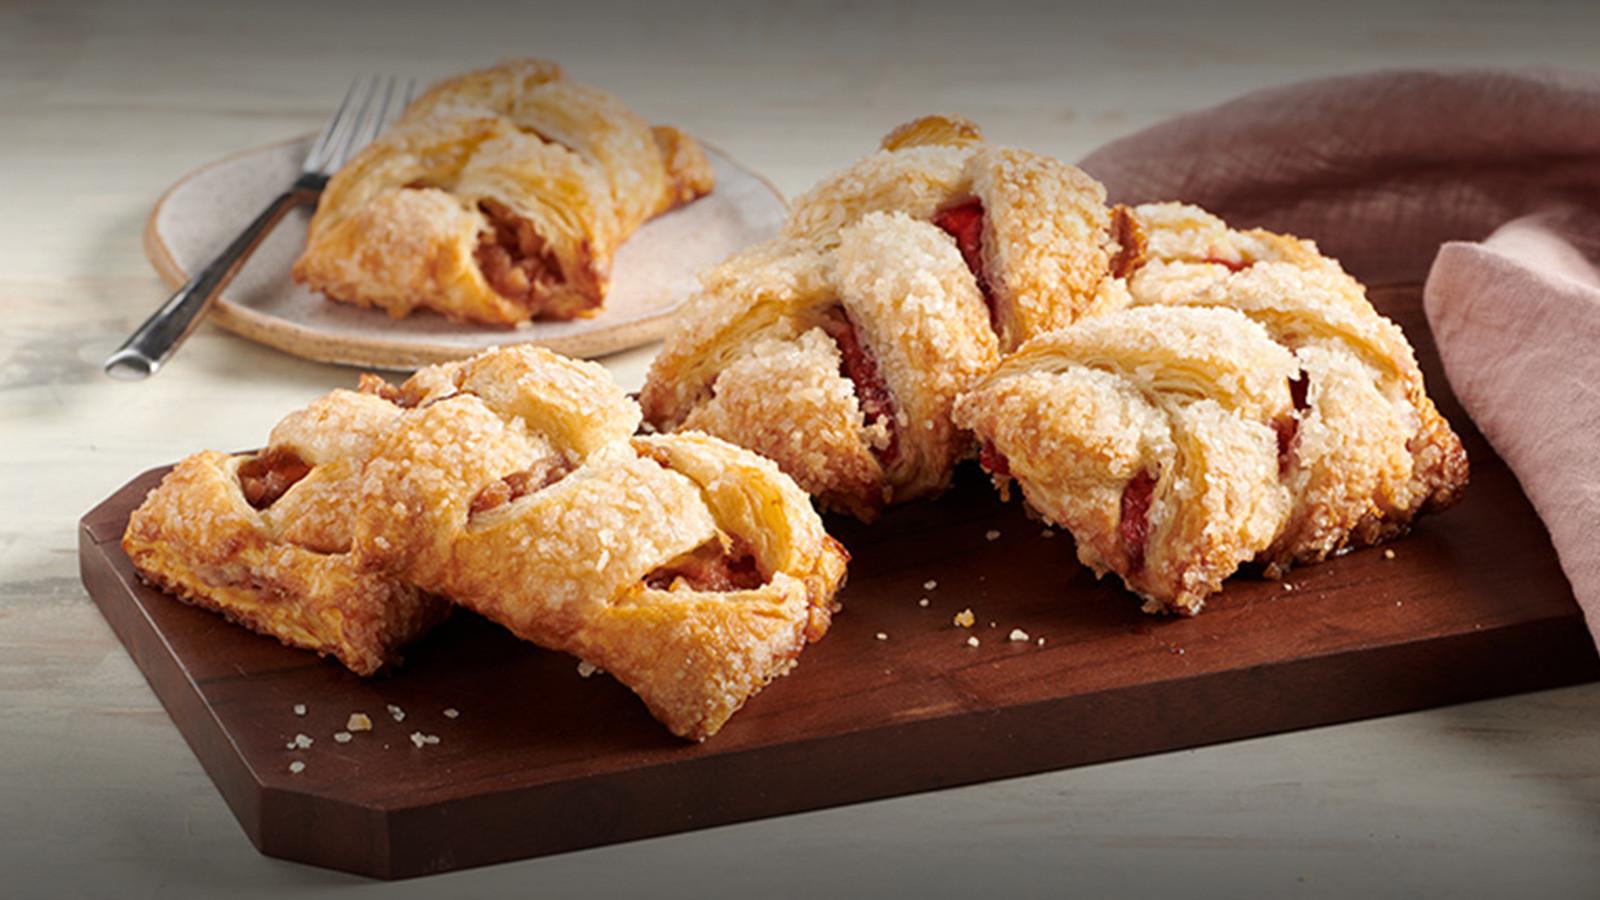 Fresh Baked Strudels & Danish Pastries